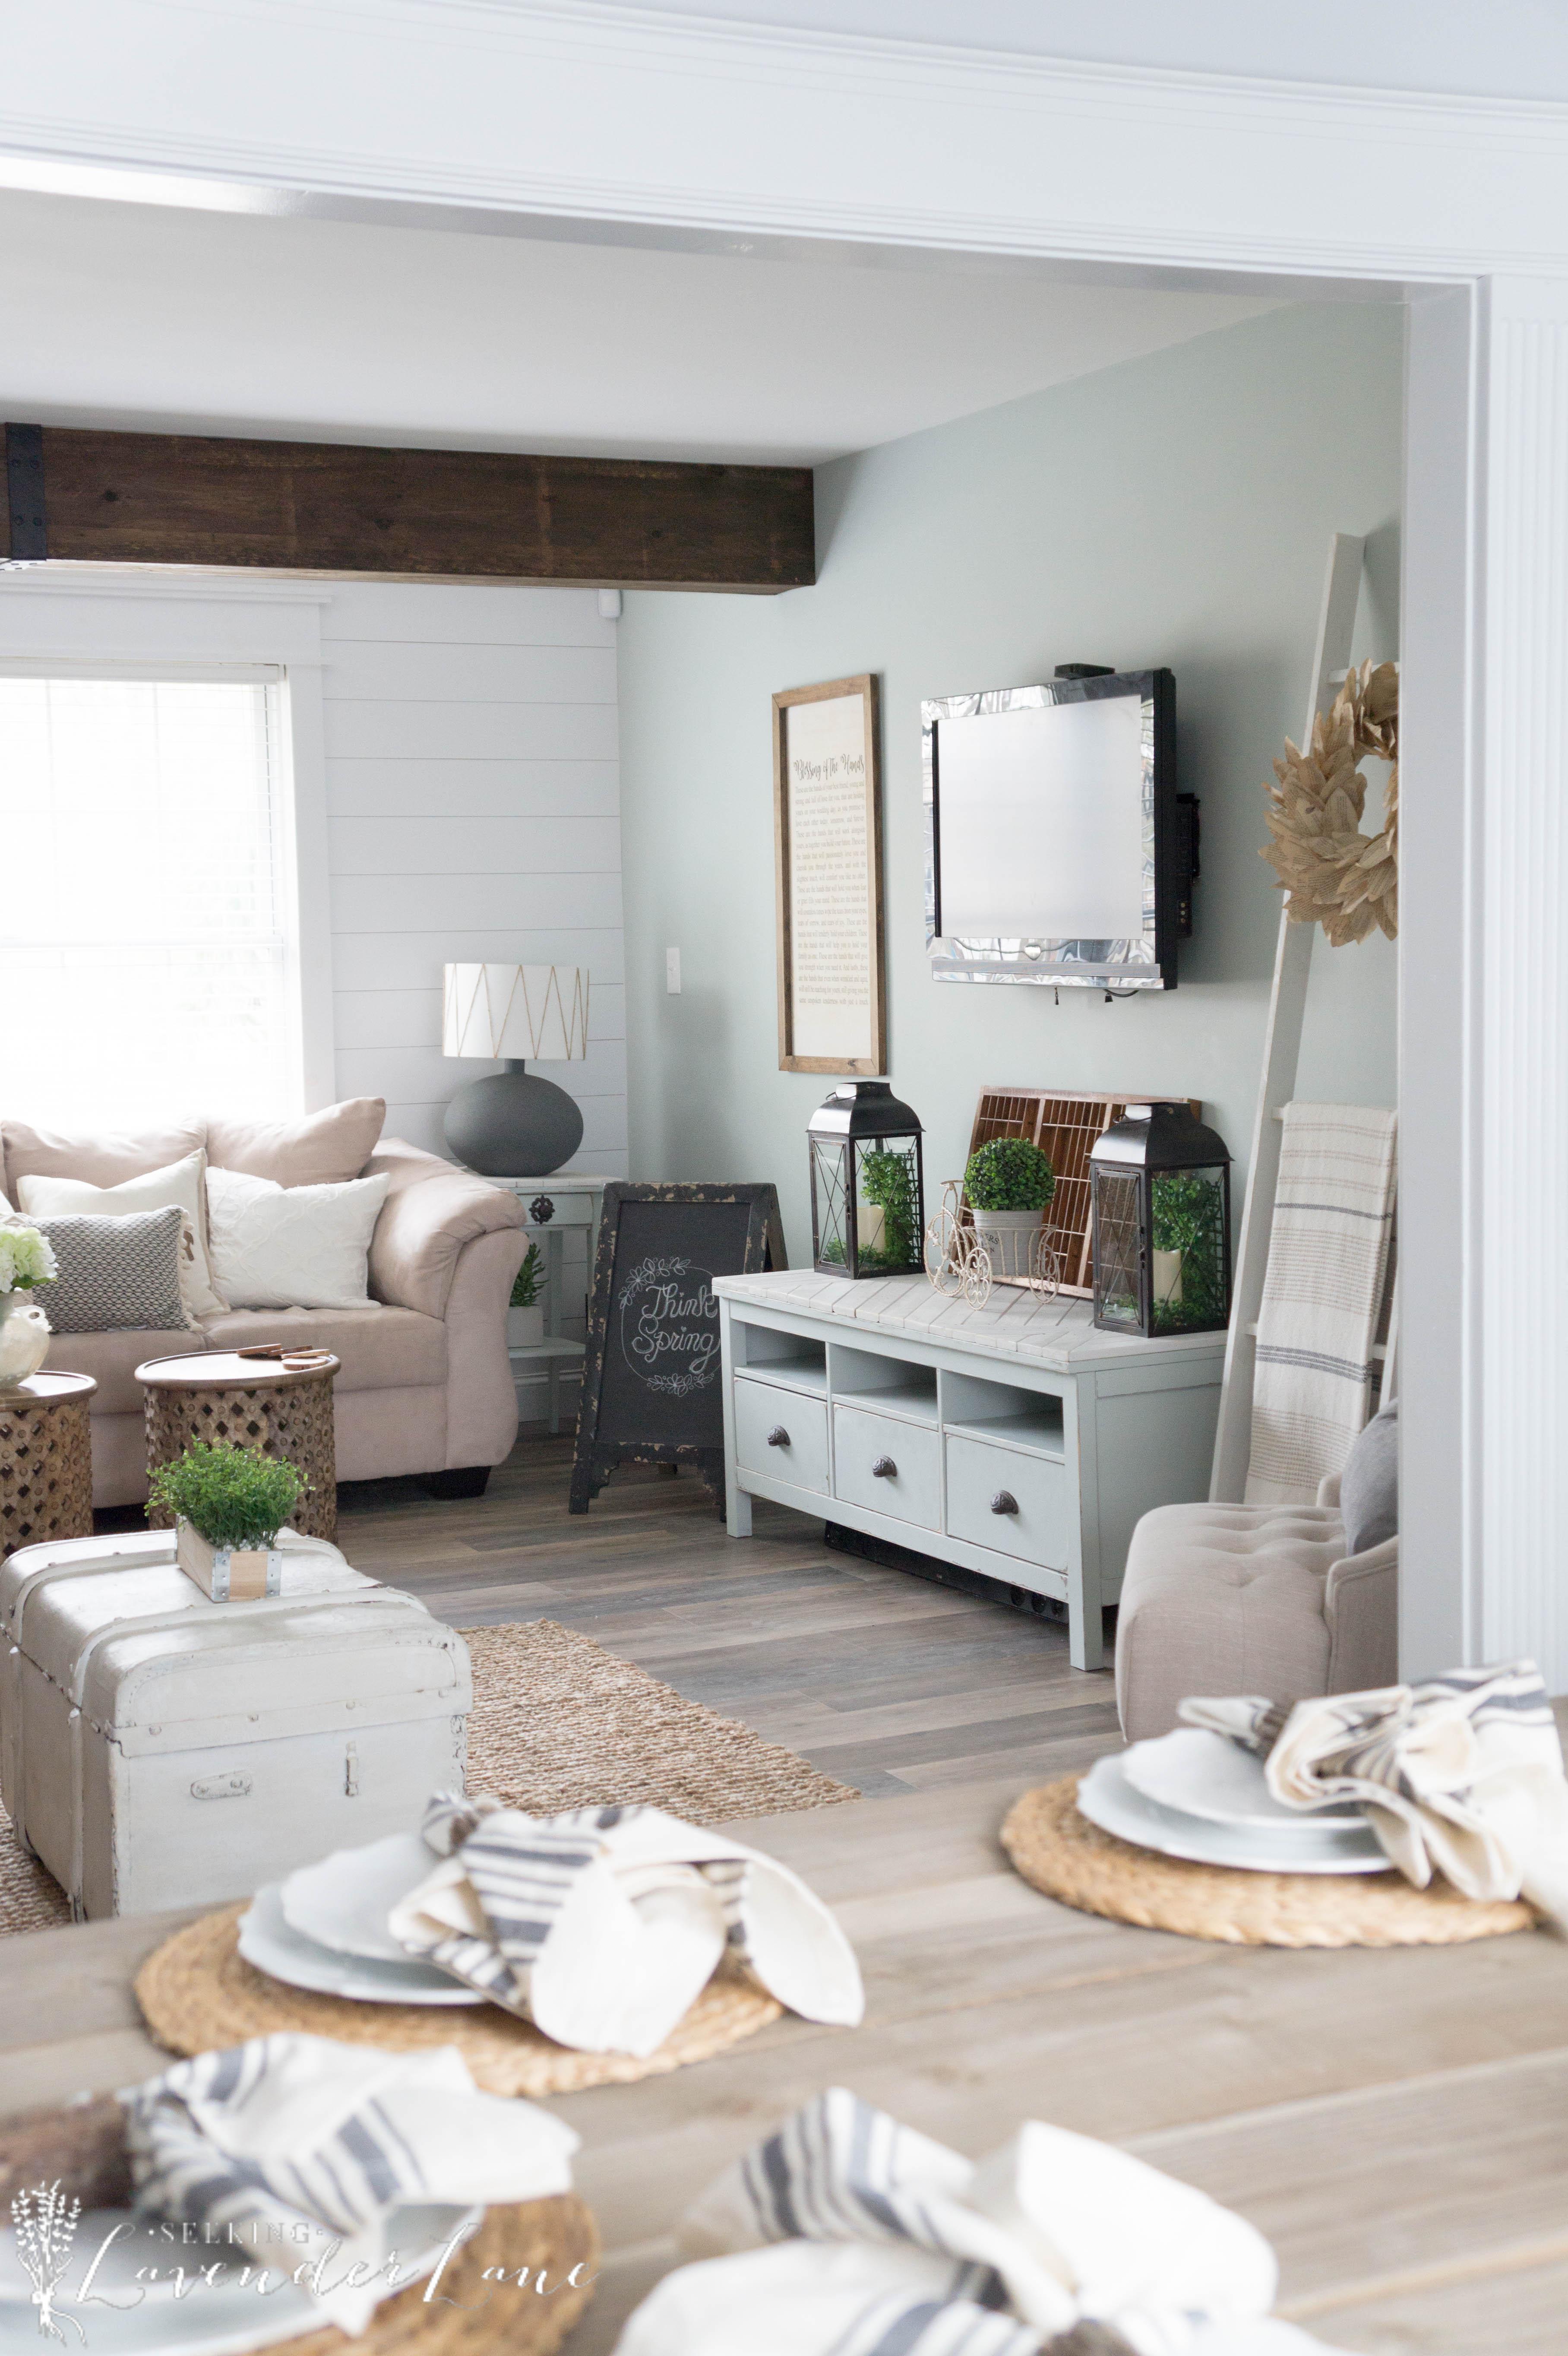 Farmhouse Family Room on a Budget - Seeking Lavendar Lane